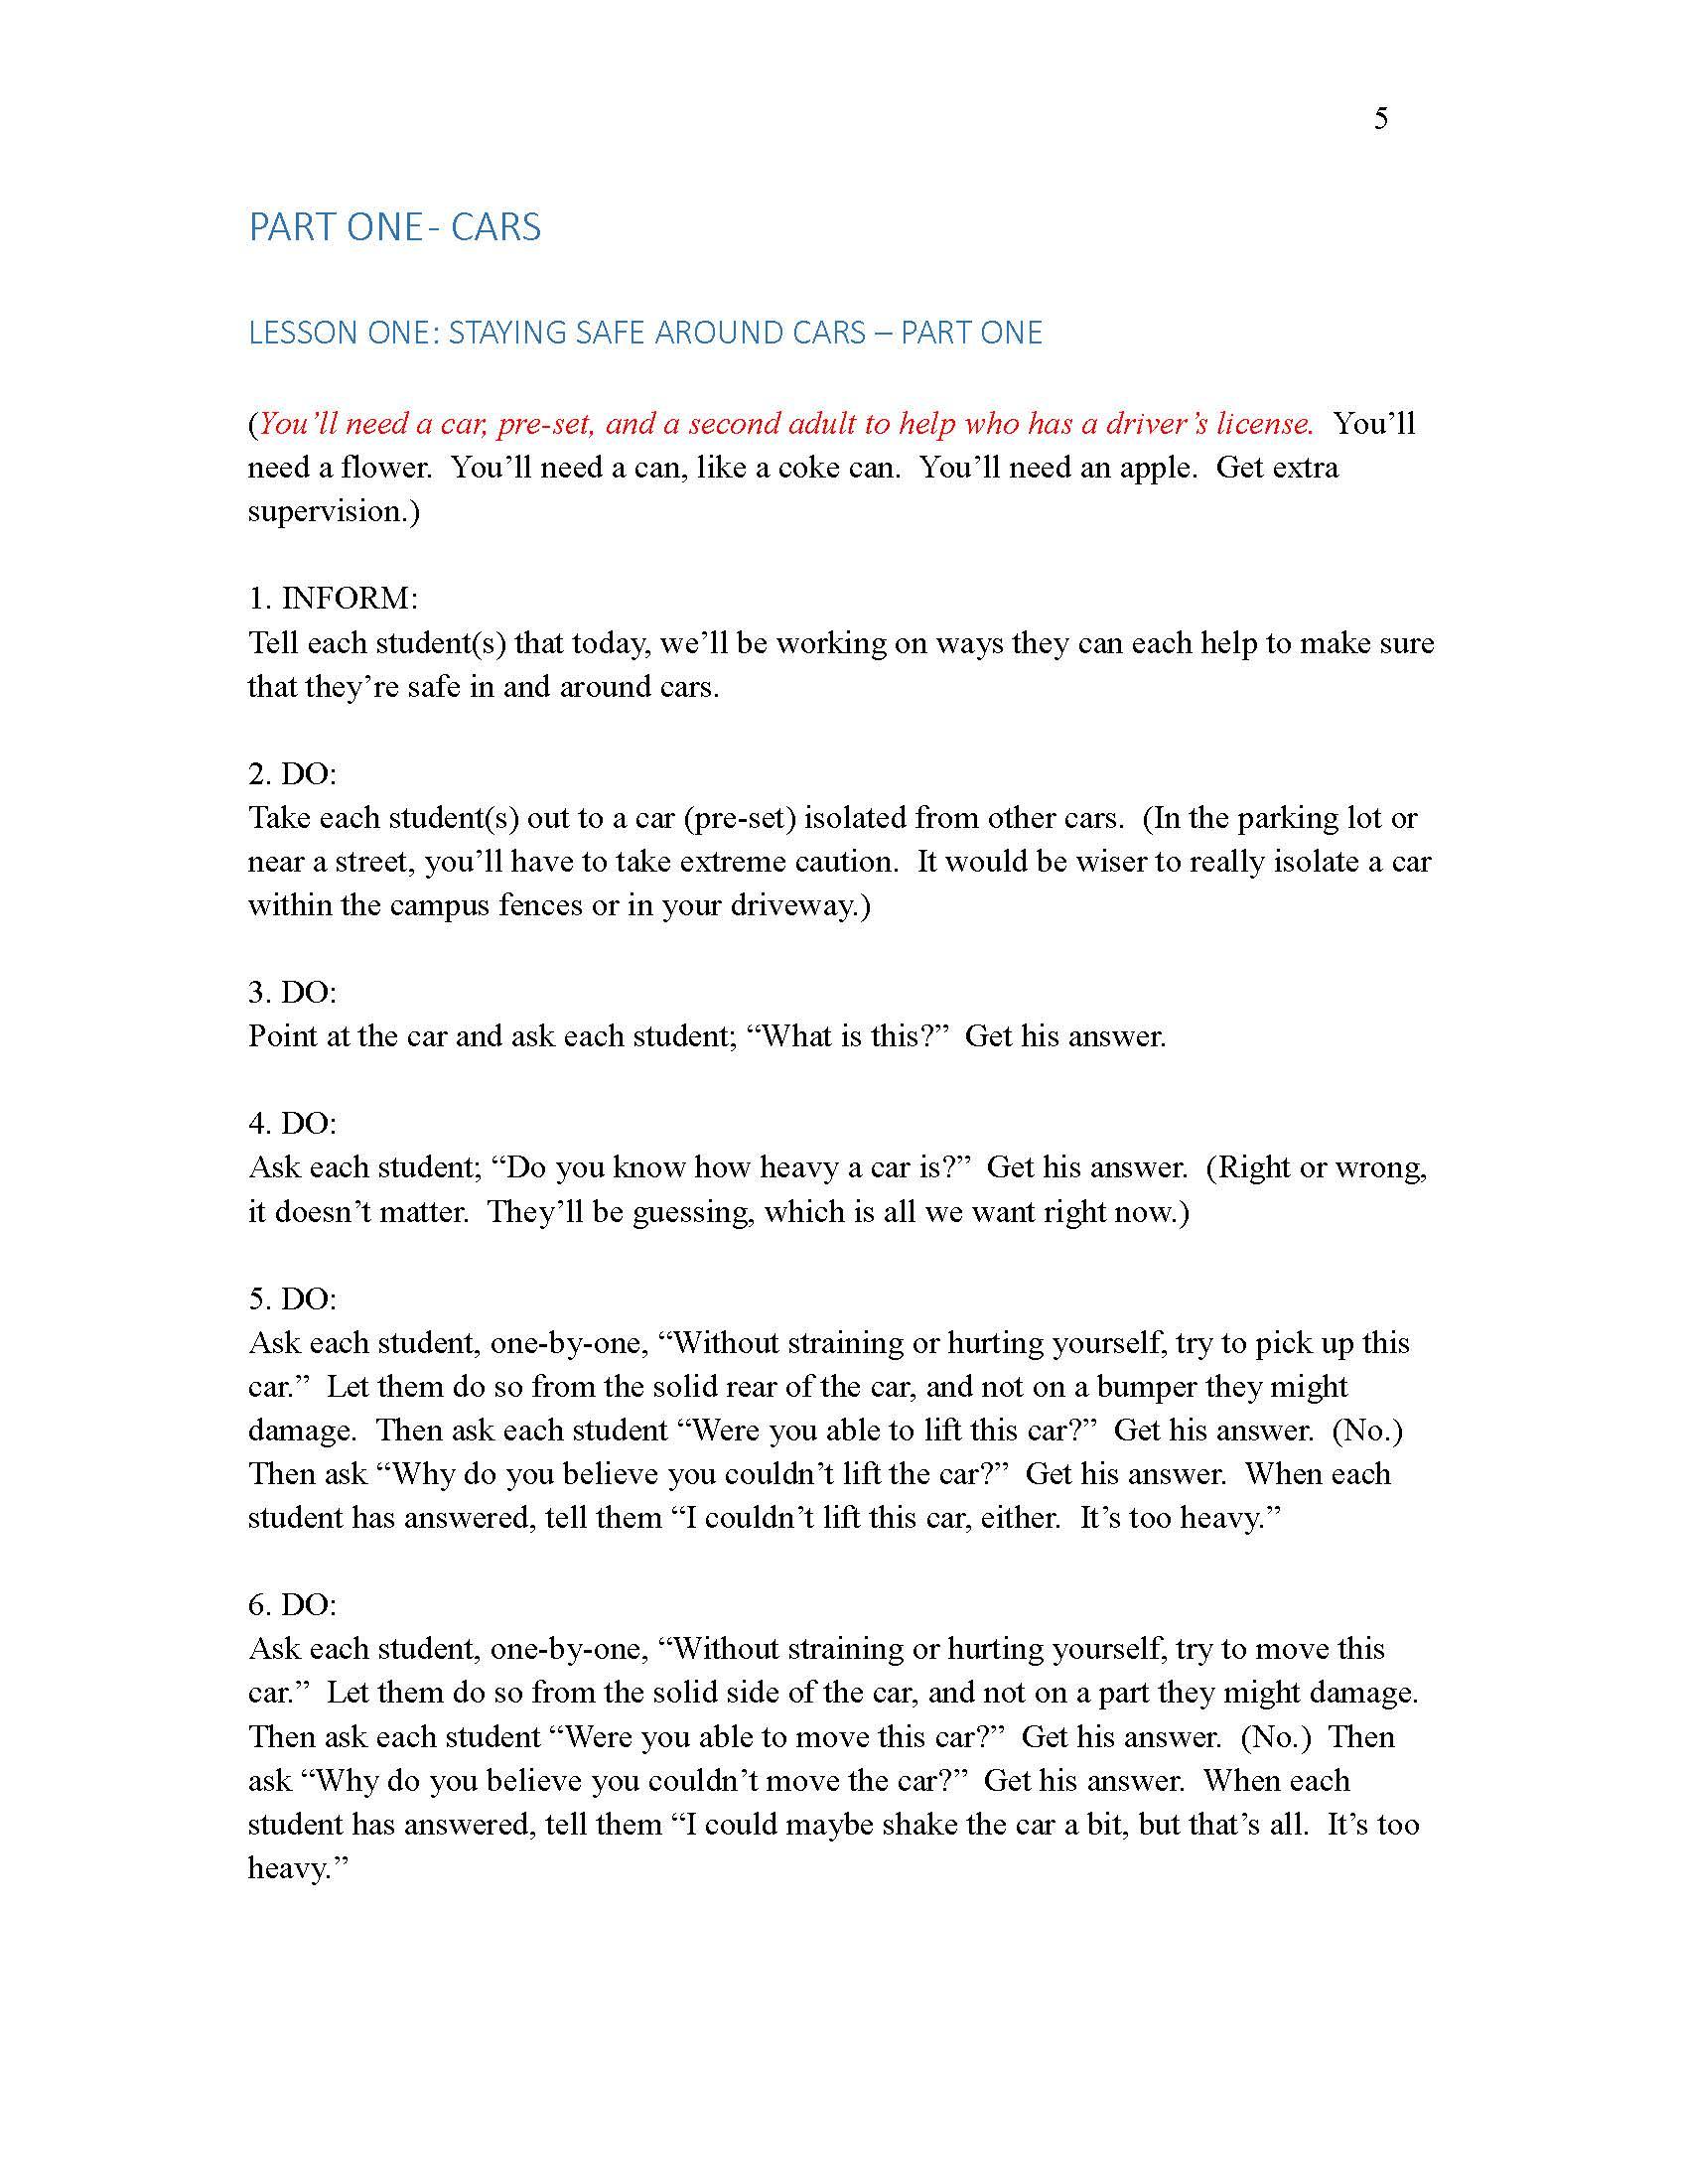 Step 1 Study & Life Skills 2 - Cars Streets_Page_06.jpg